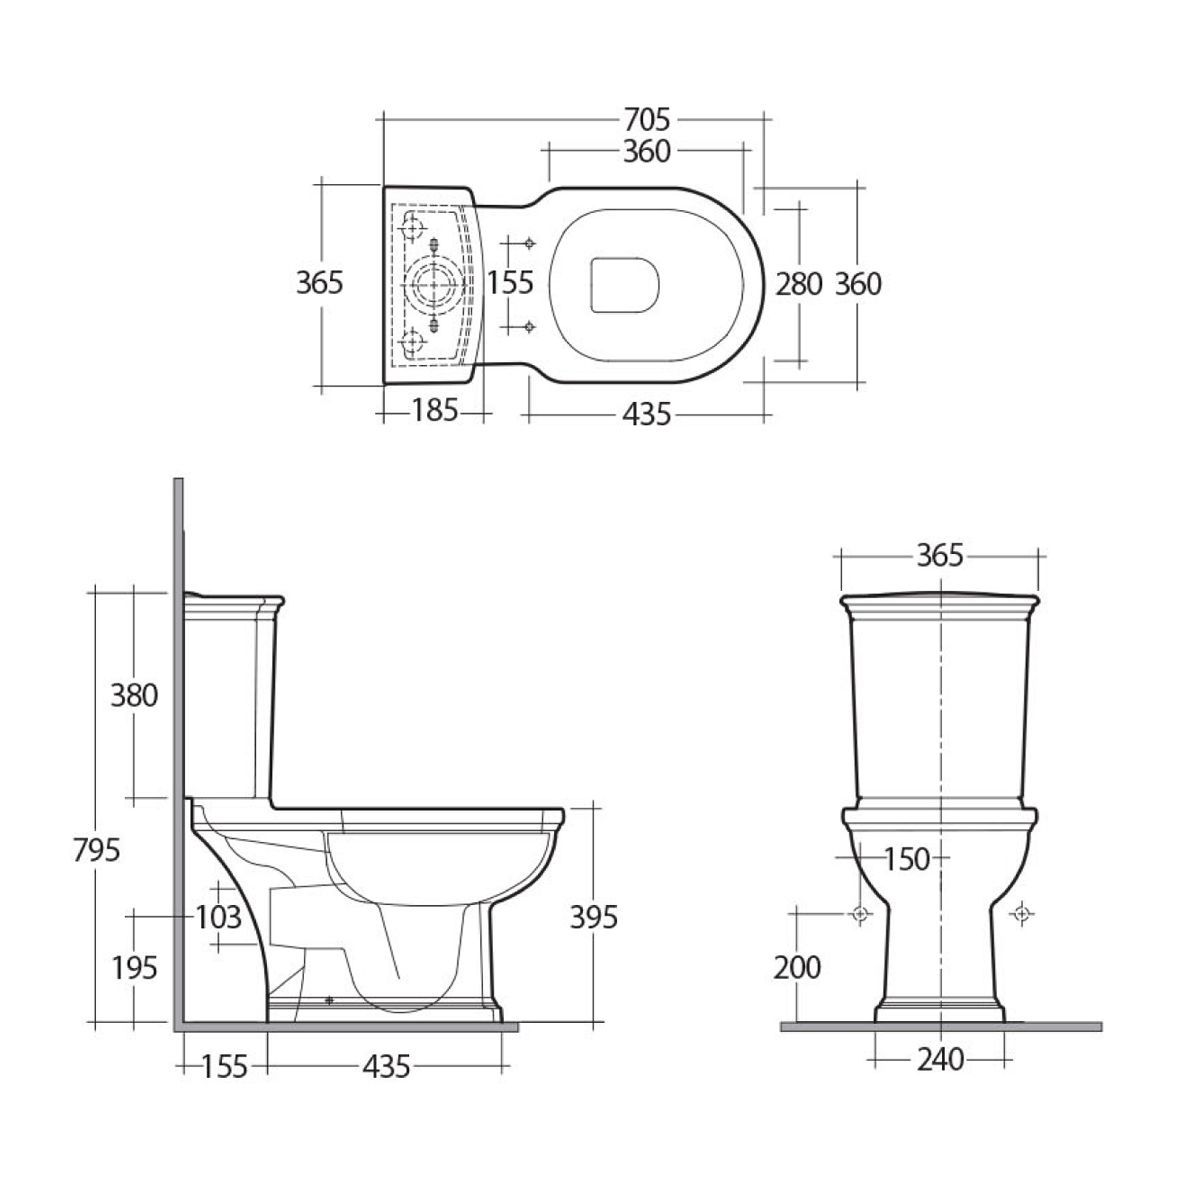 RAK Washington Full Access Close Coupled Toilet Measurements